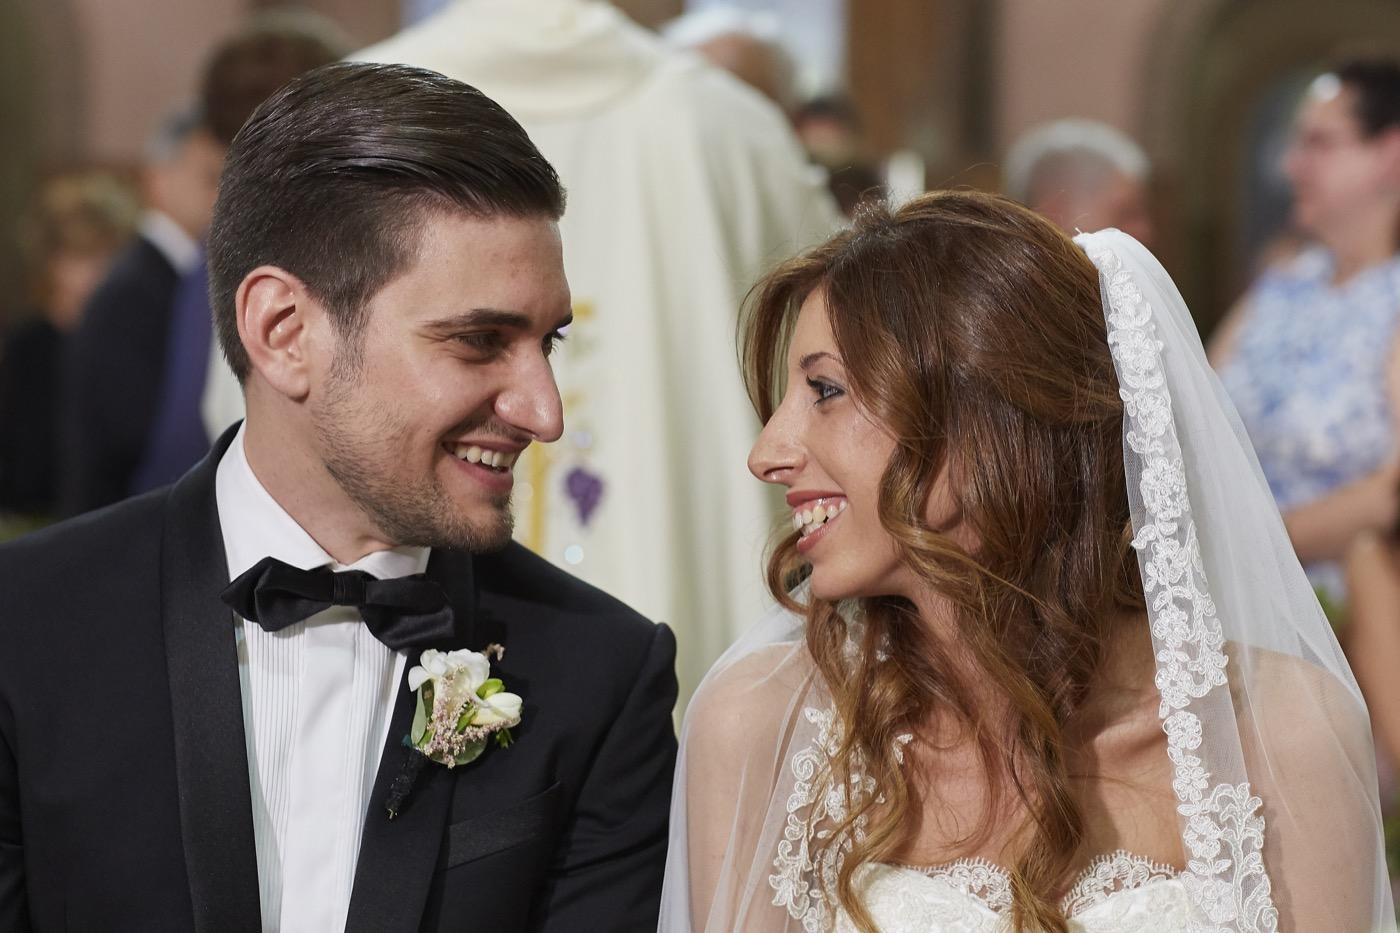 Claudio-Coppola-wedding-photographer-abbazia-7-frati-piegaro-54